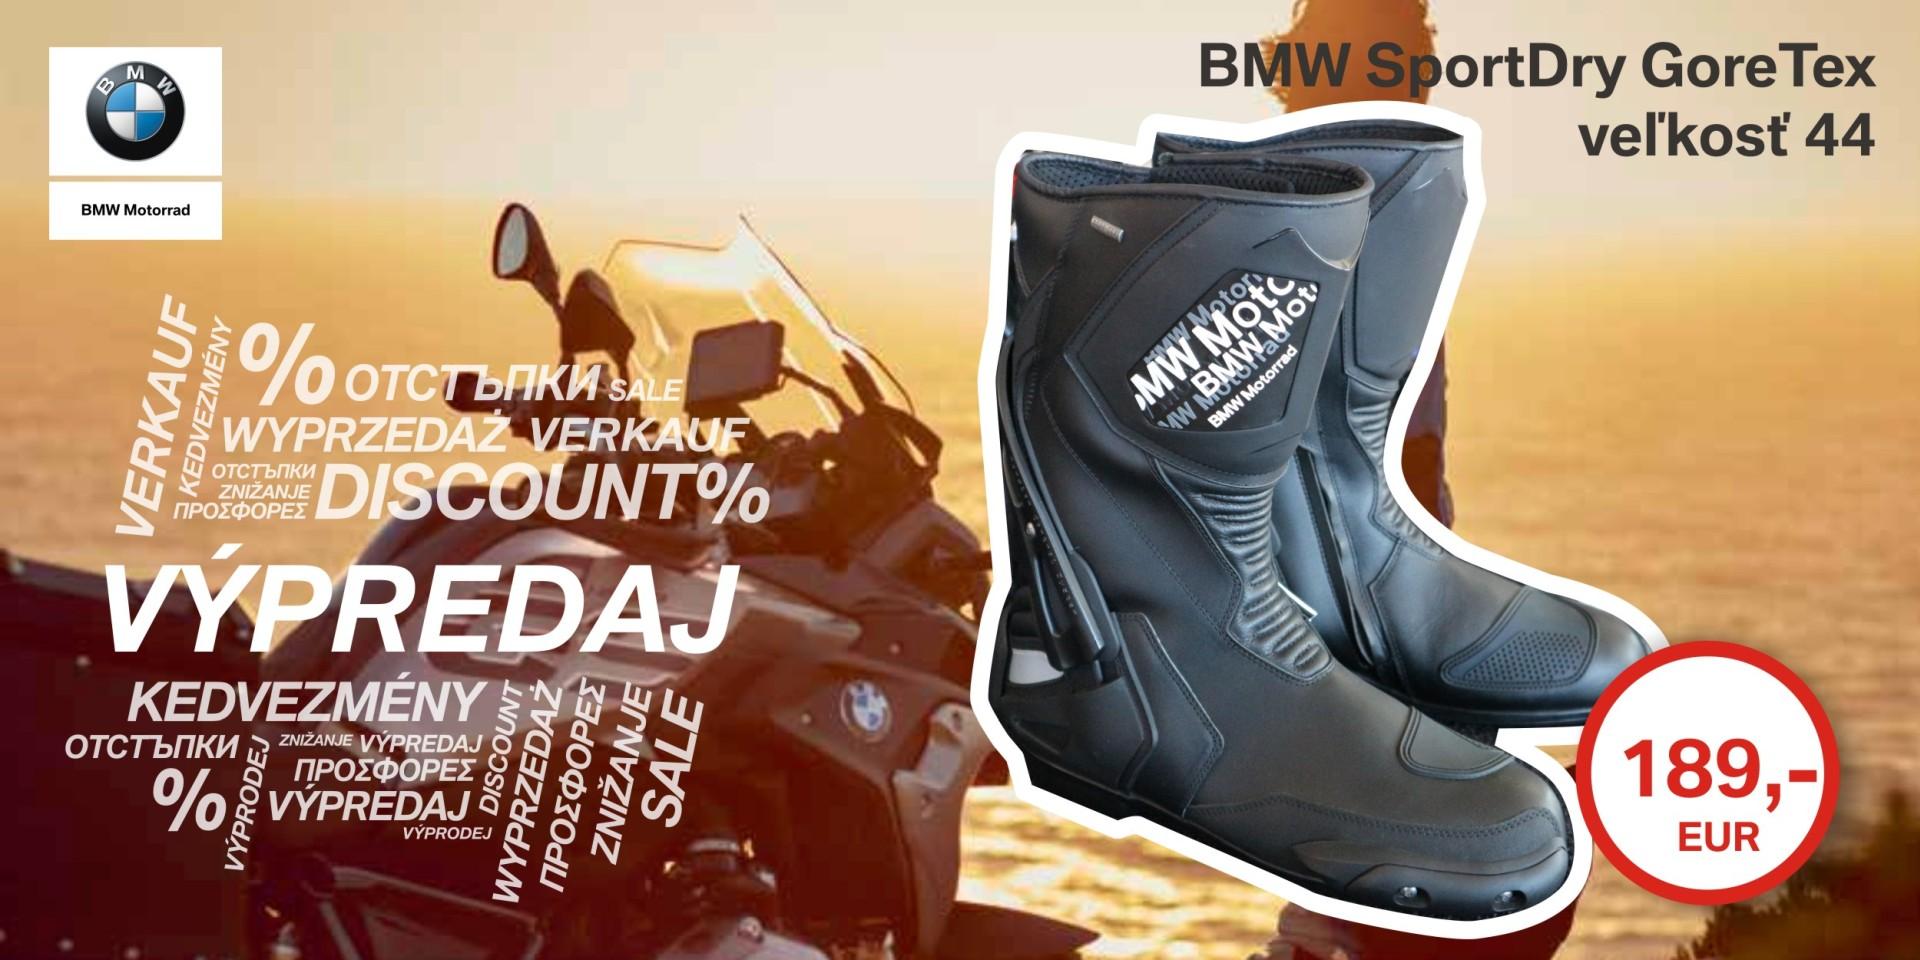 9bc6f856d52c Športové čižmy BMW SportDry GoreTex